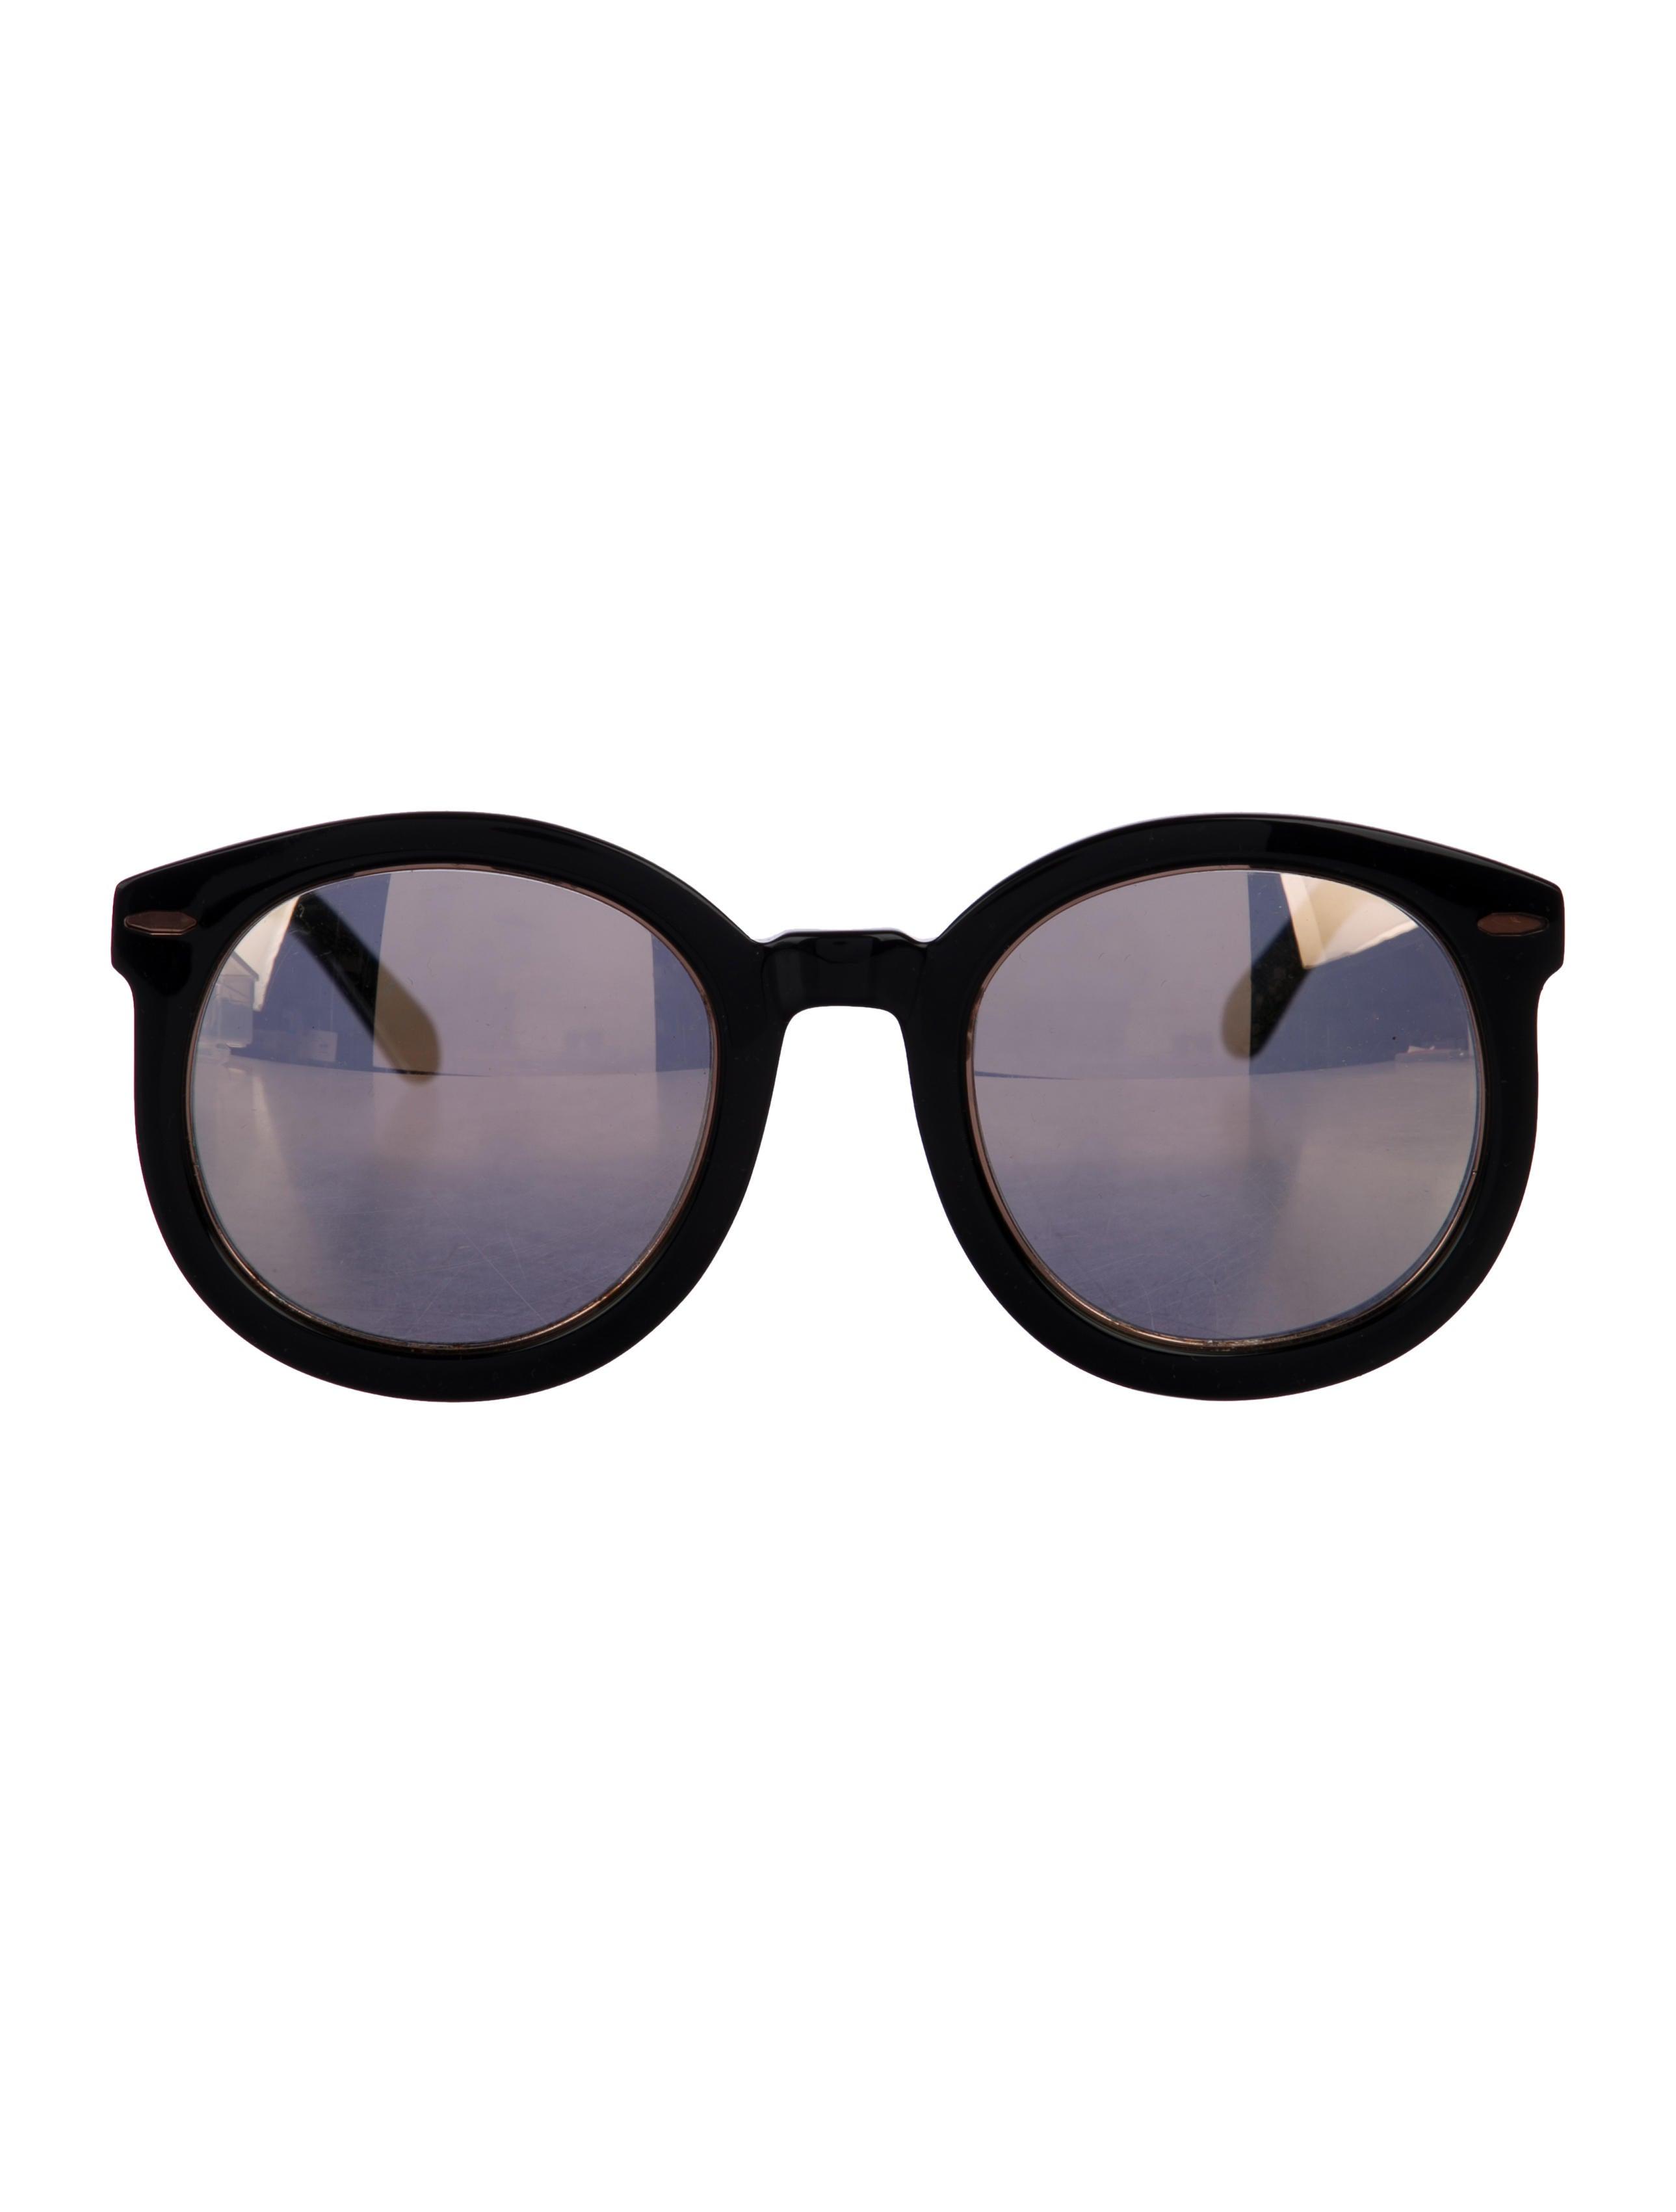 5f03ca1beb4 Karen Walker Super Duper Superstars Sunglasses - Accessories ...